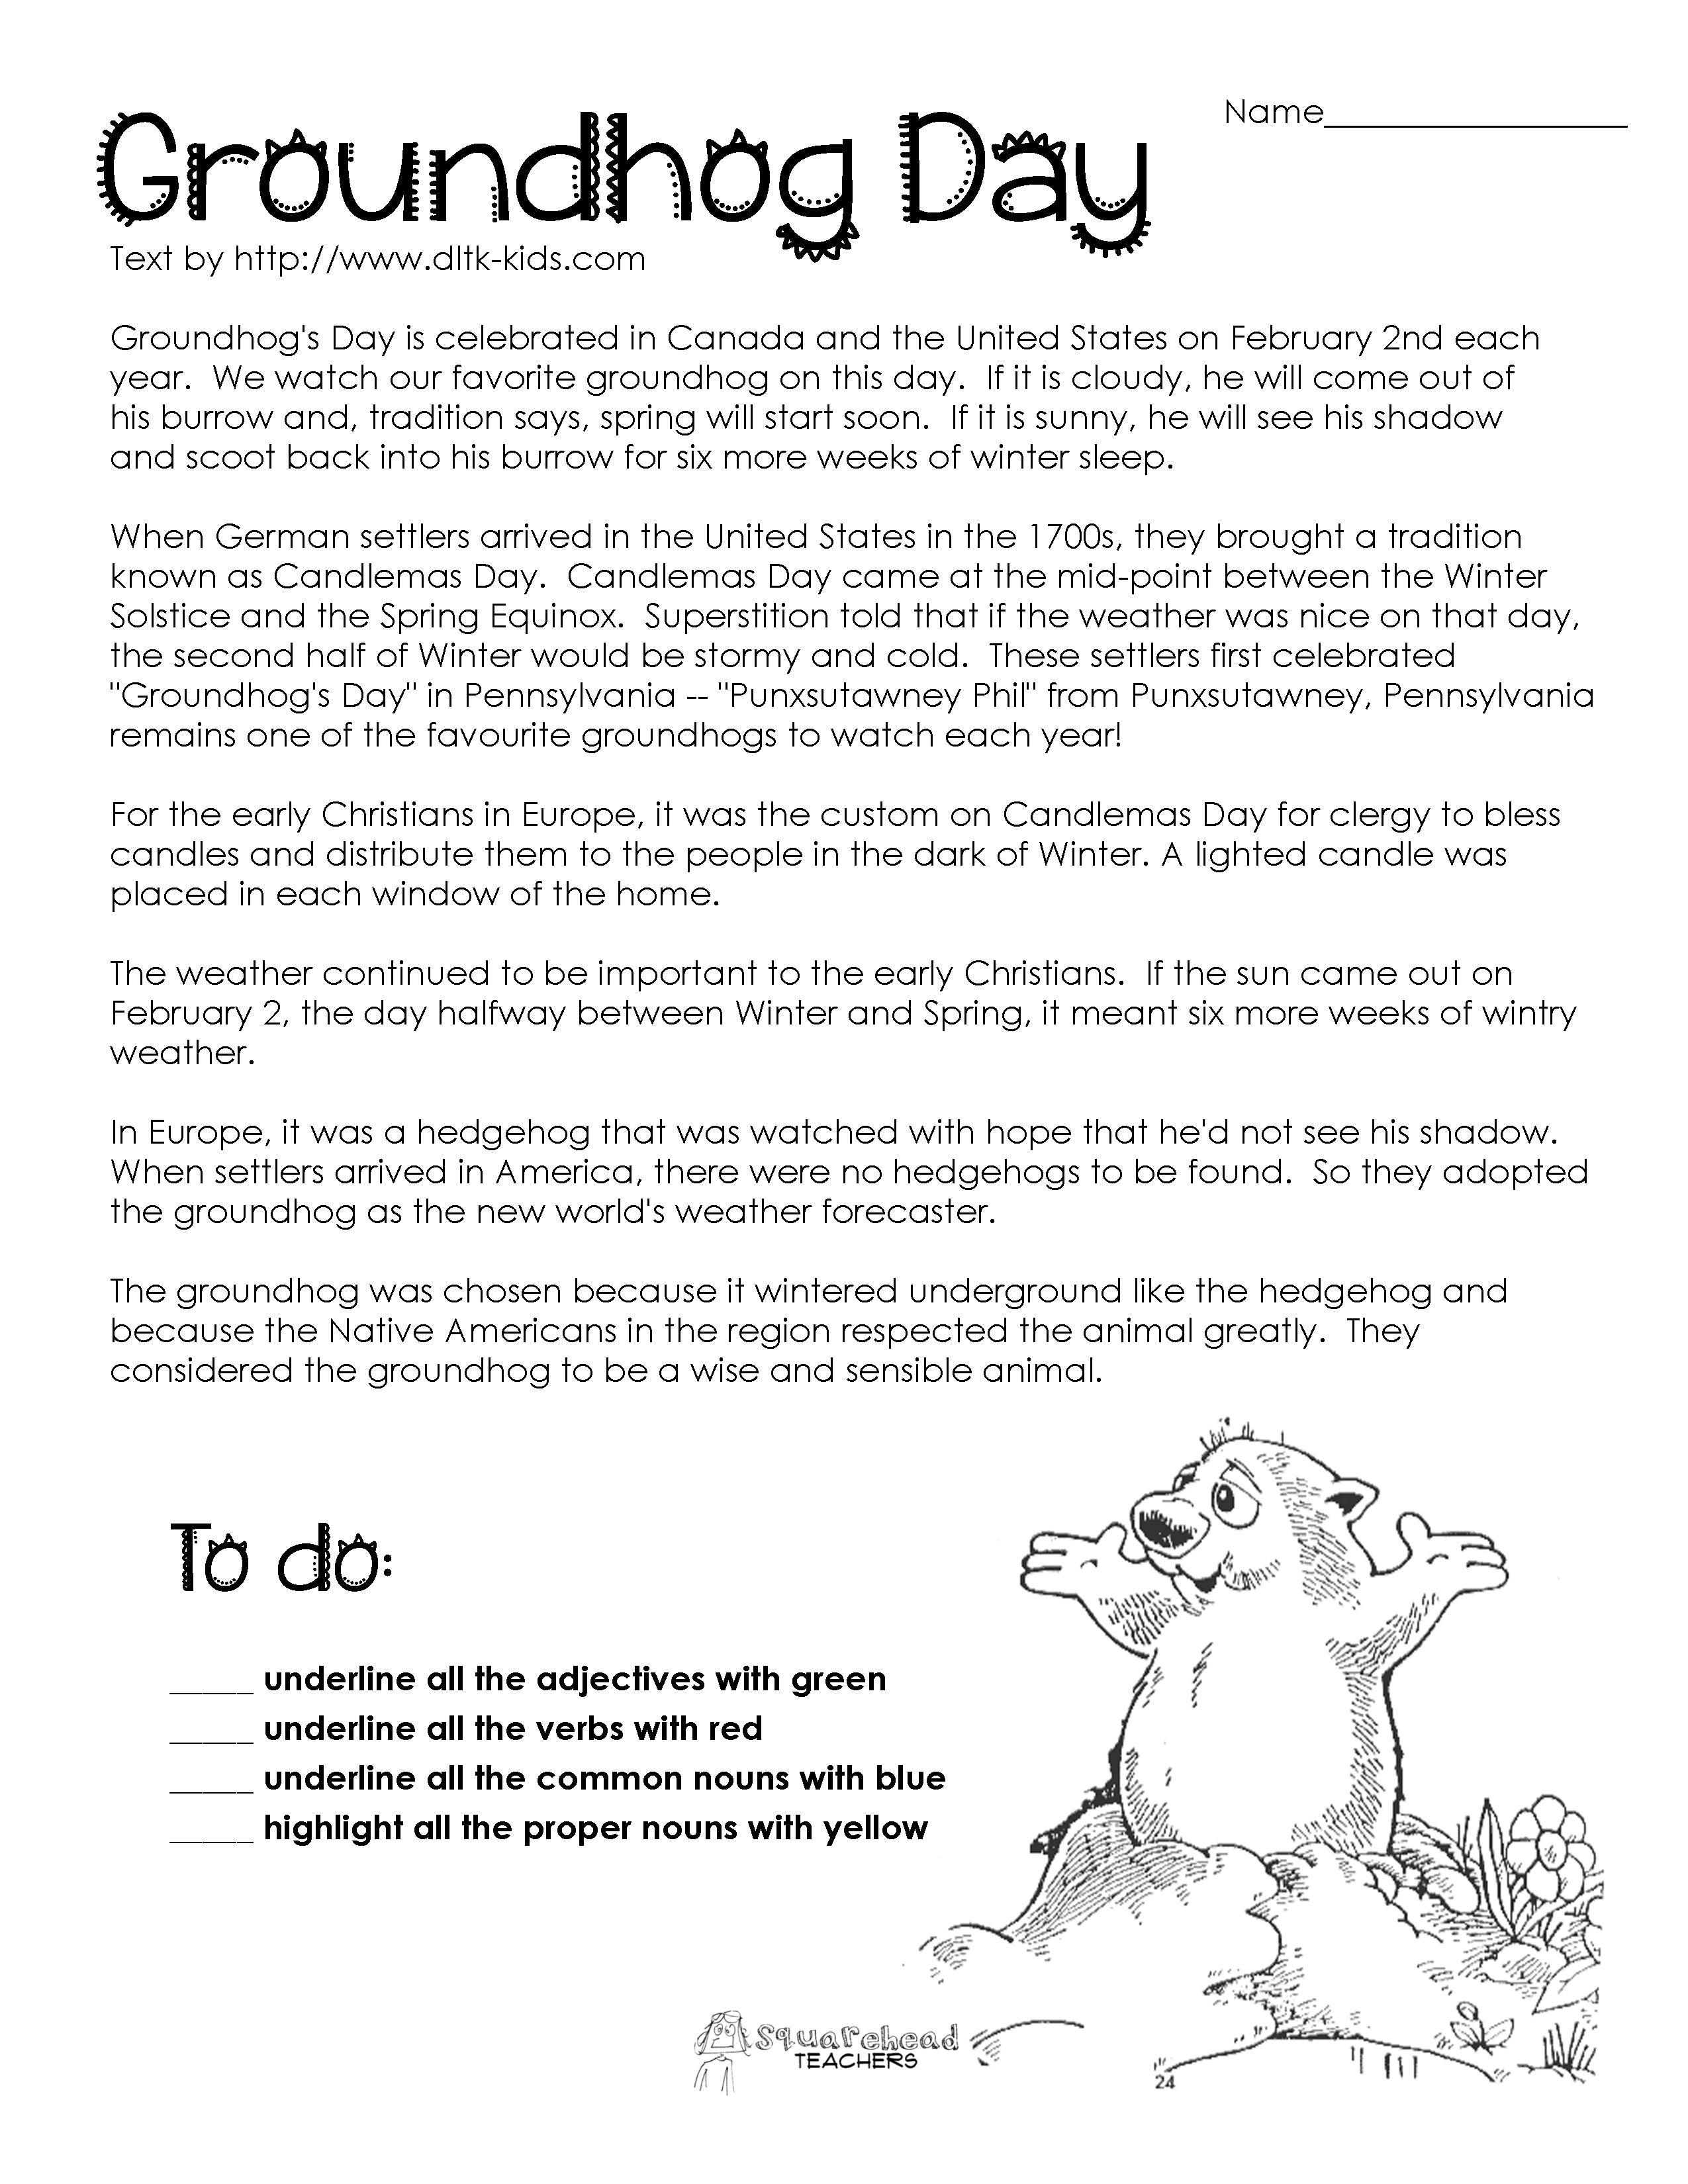 Groundhog Day Comprehension Worksheets - Google Search   Ground Hog - Free Printable Groundhog Day Reading Comprehension Worksheets